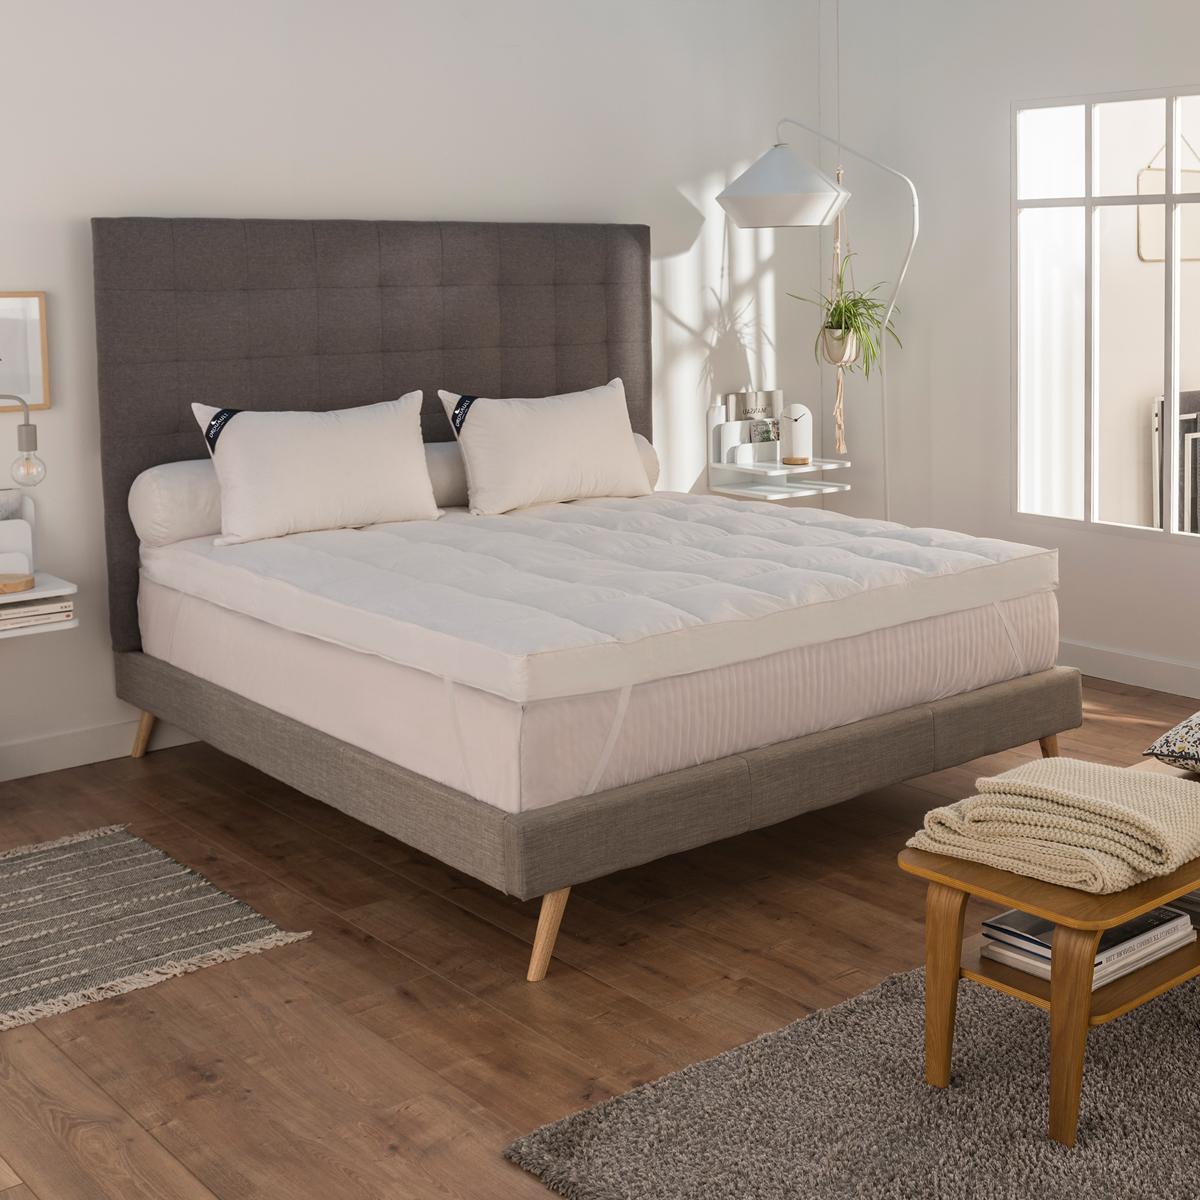 Surconfort de Matelas Haut Luxe Pro 80x200 cm